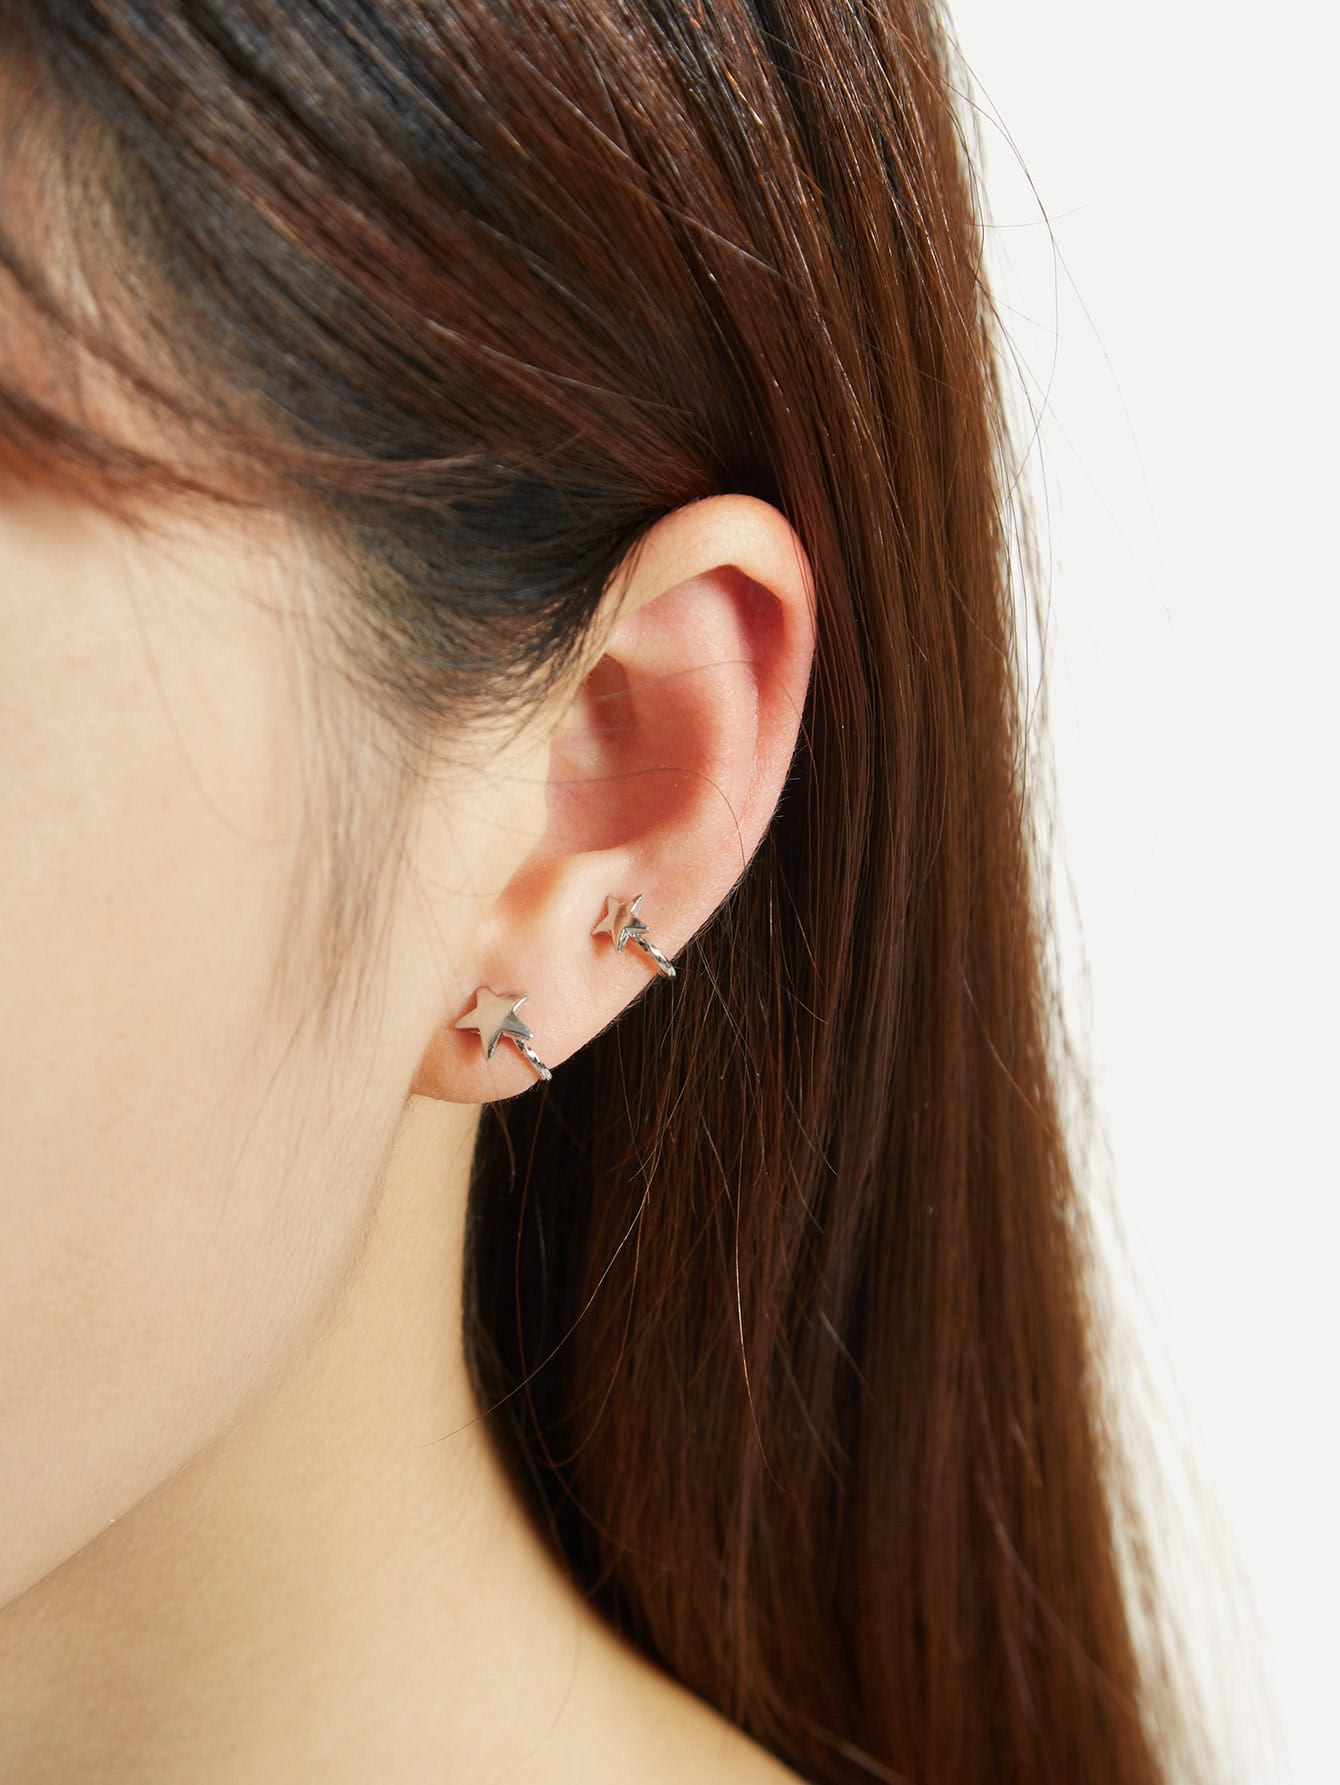 Double Star Design Ear Cuff 1pc 1pc 6ed1053 1fg00 0ba0